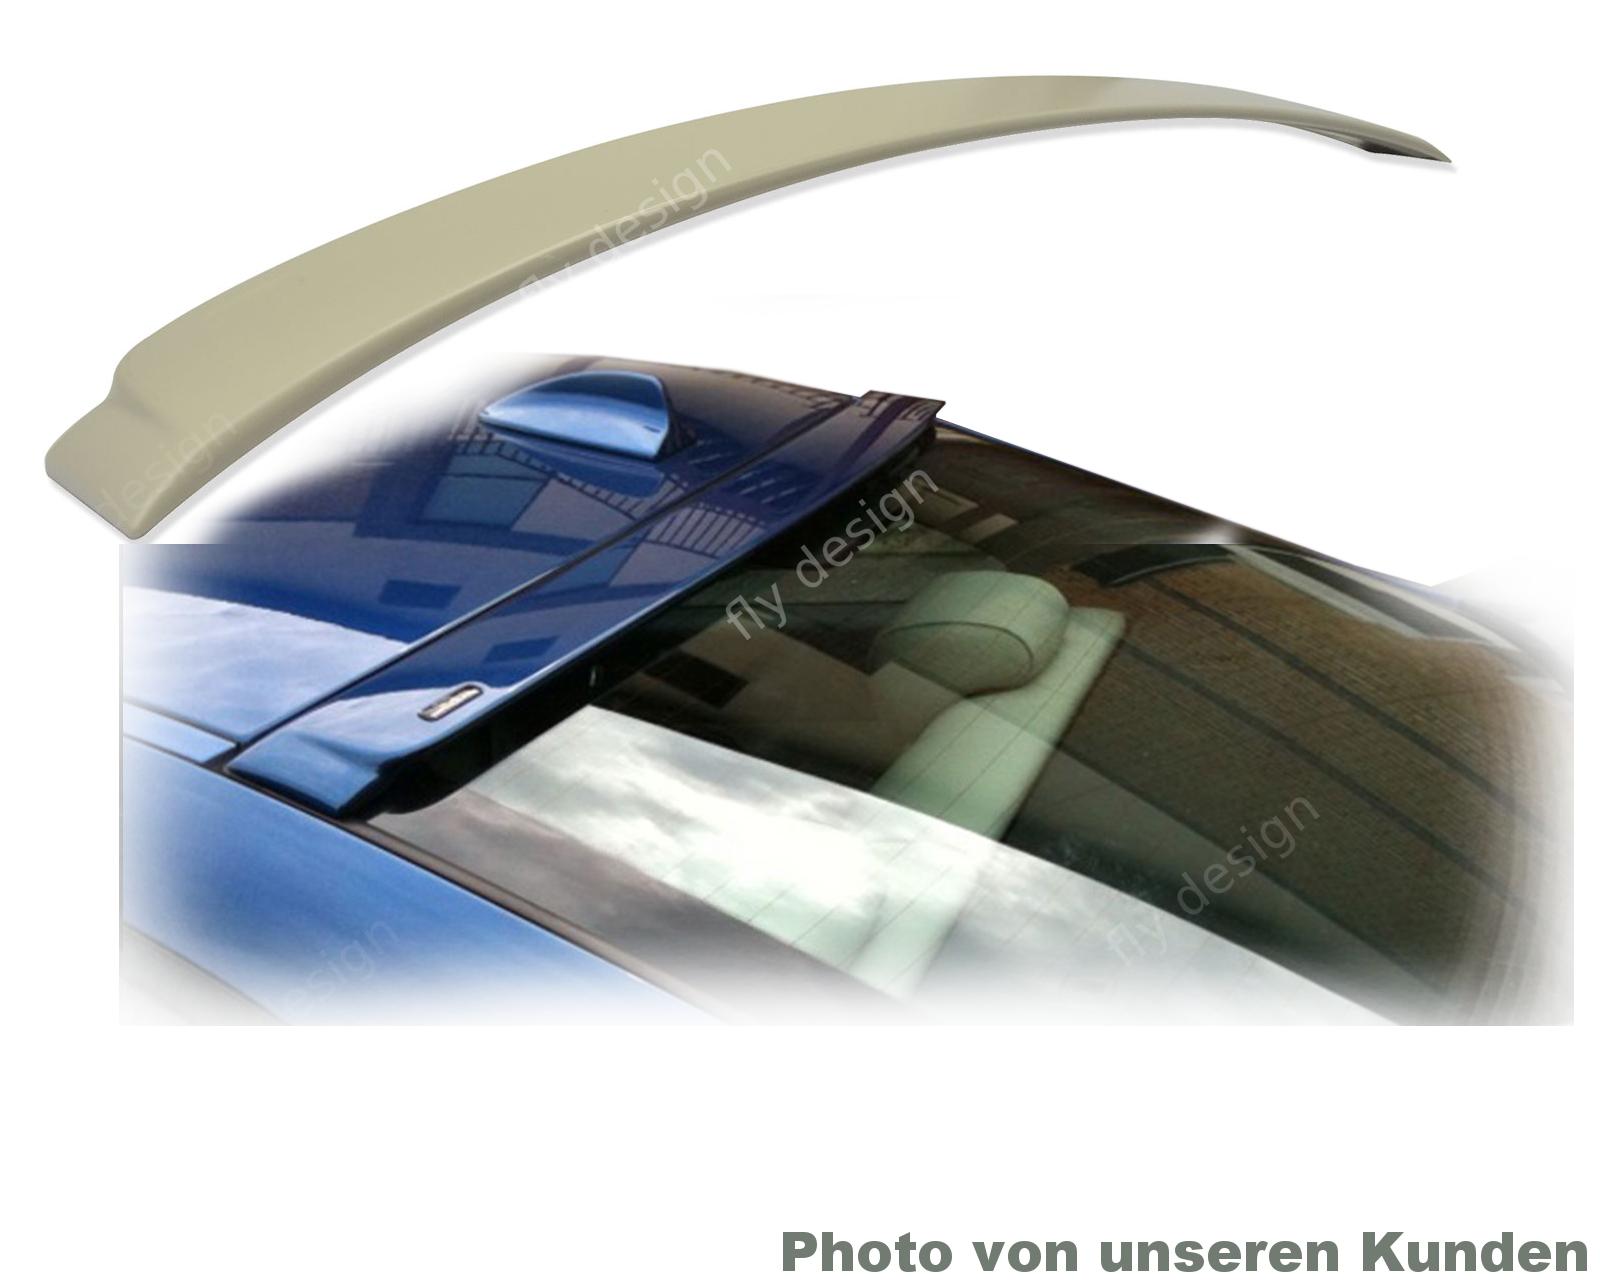 DACHSPOILER-FLUGEL-passend-BMW-3-er-E92-COUPE-Type-A-Roofspoiler-becquet-levre